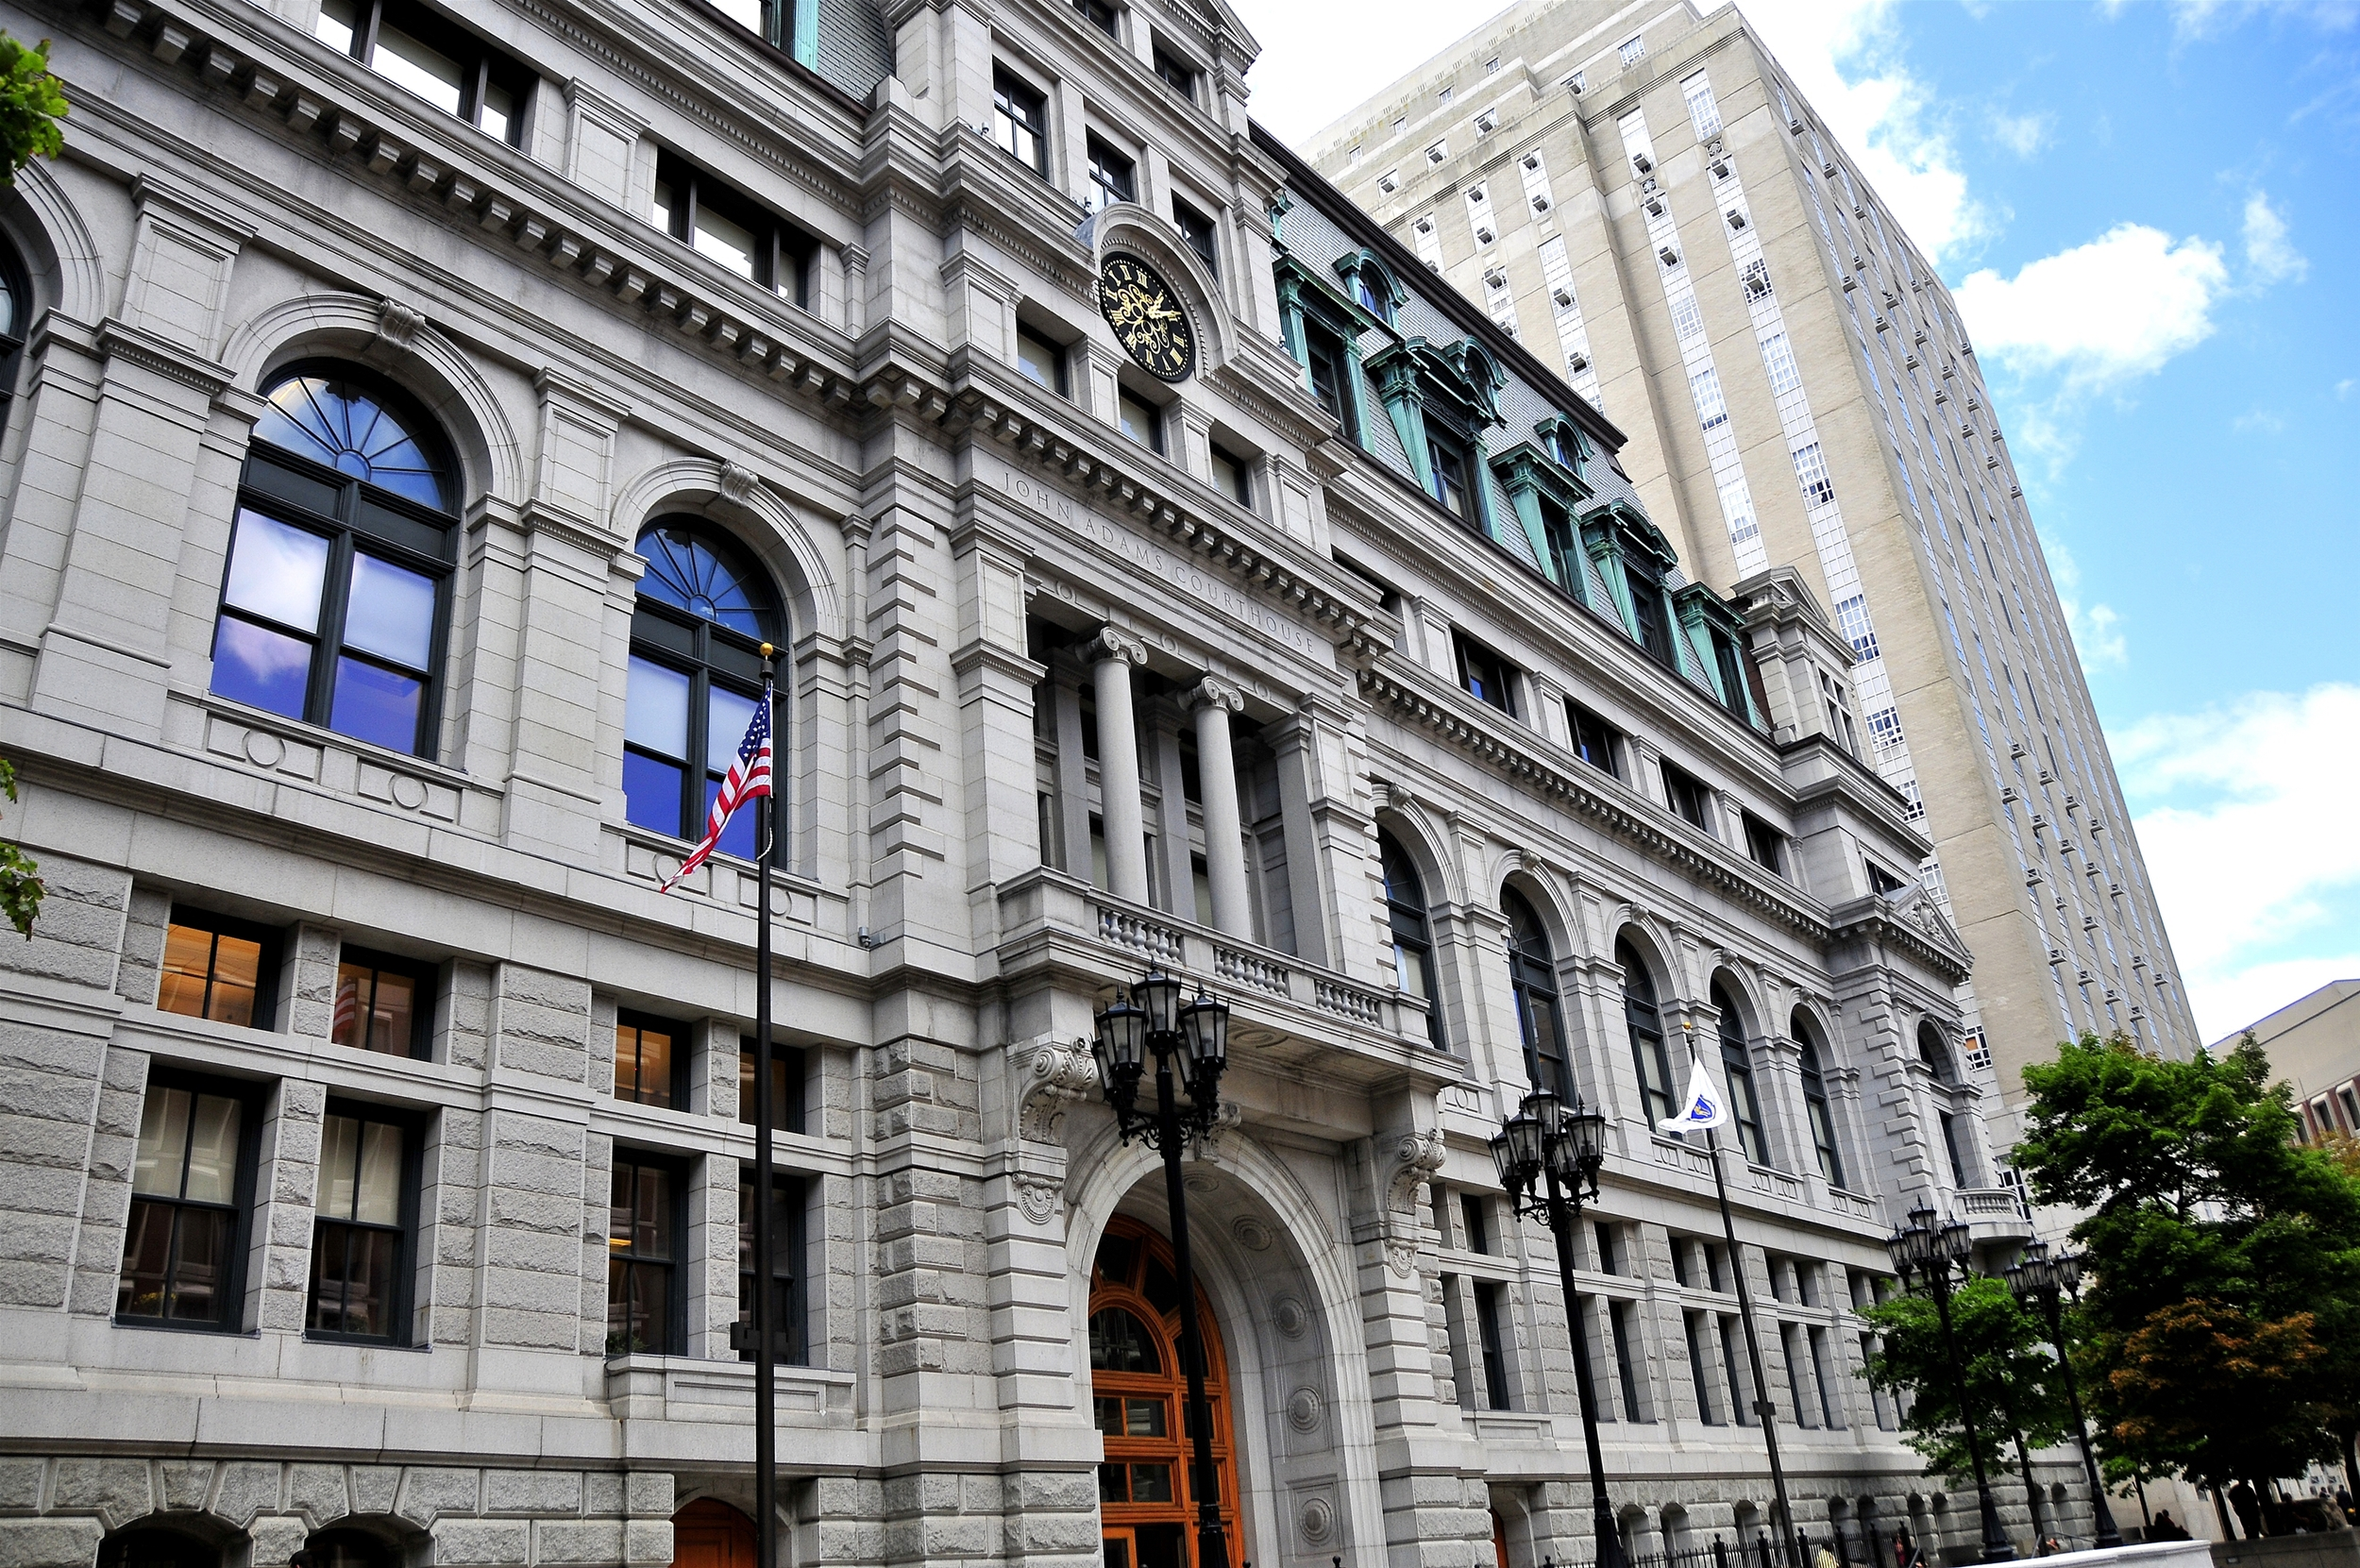 featurepics-Boston-John-Adams-Courthouse--1618096.jpg